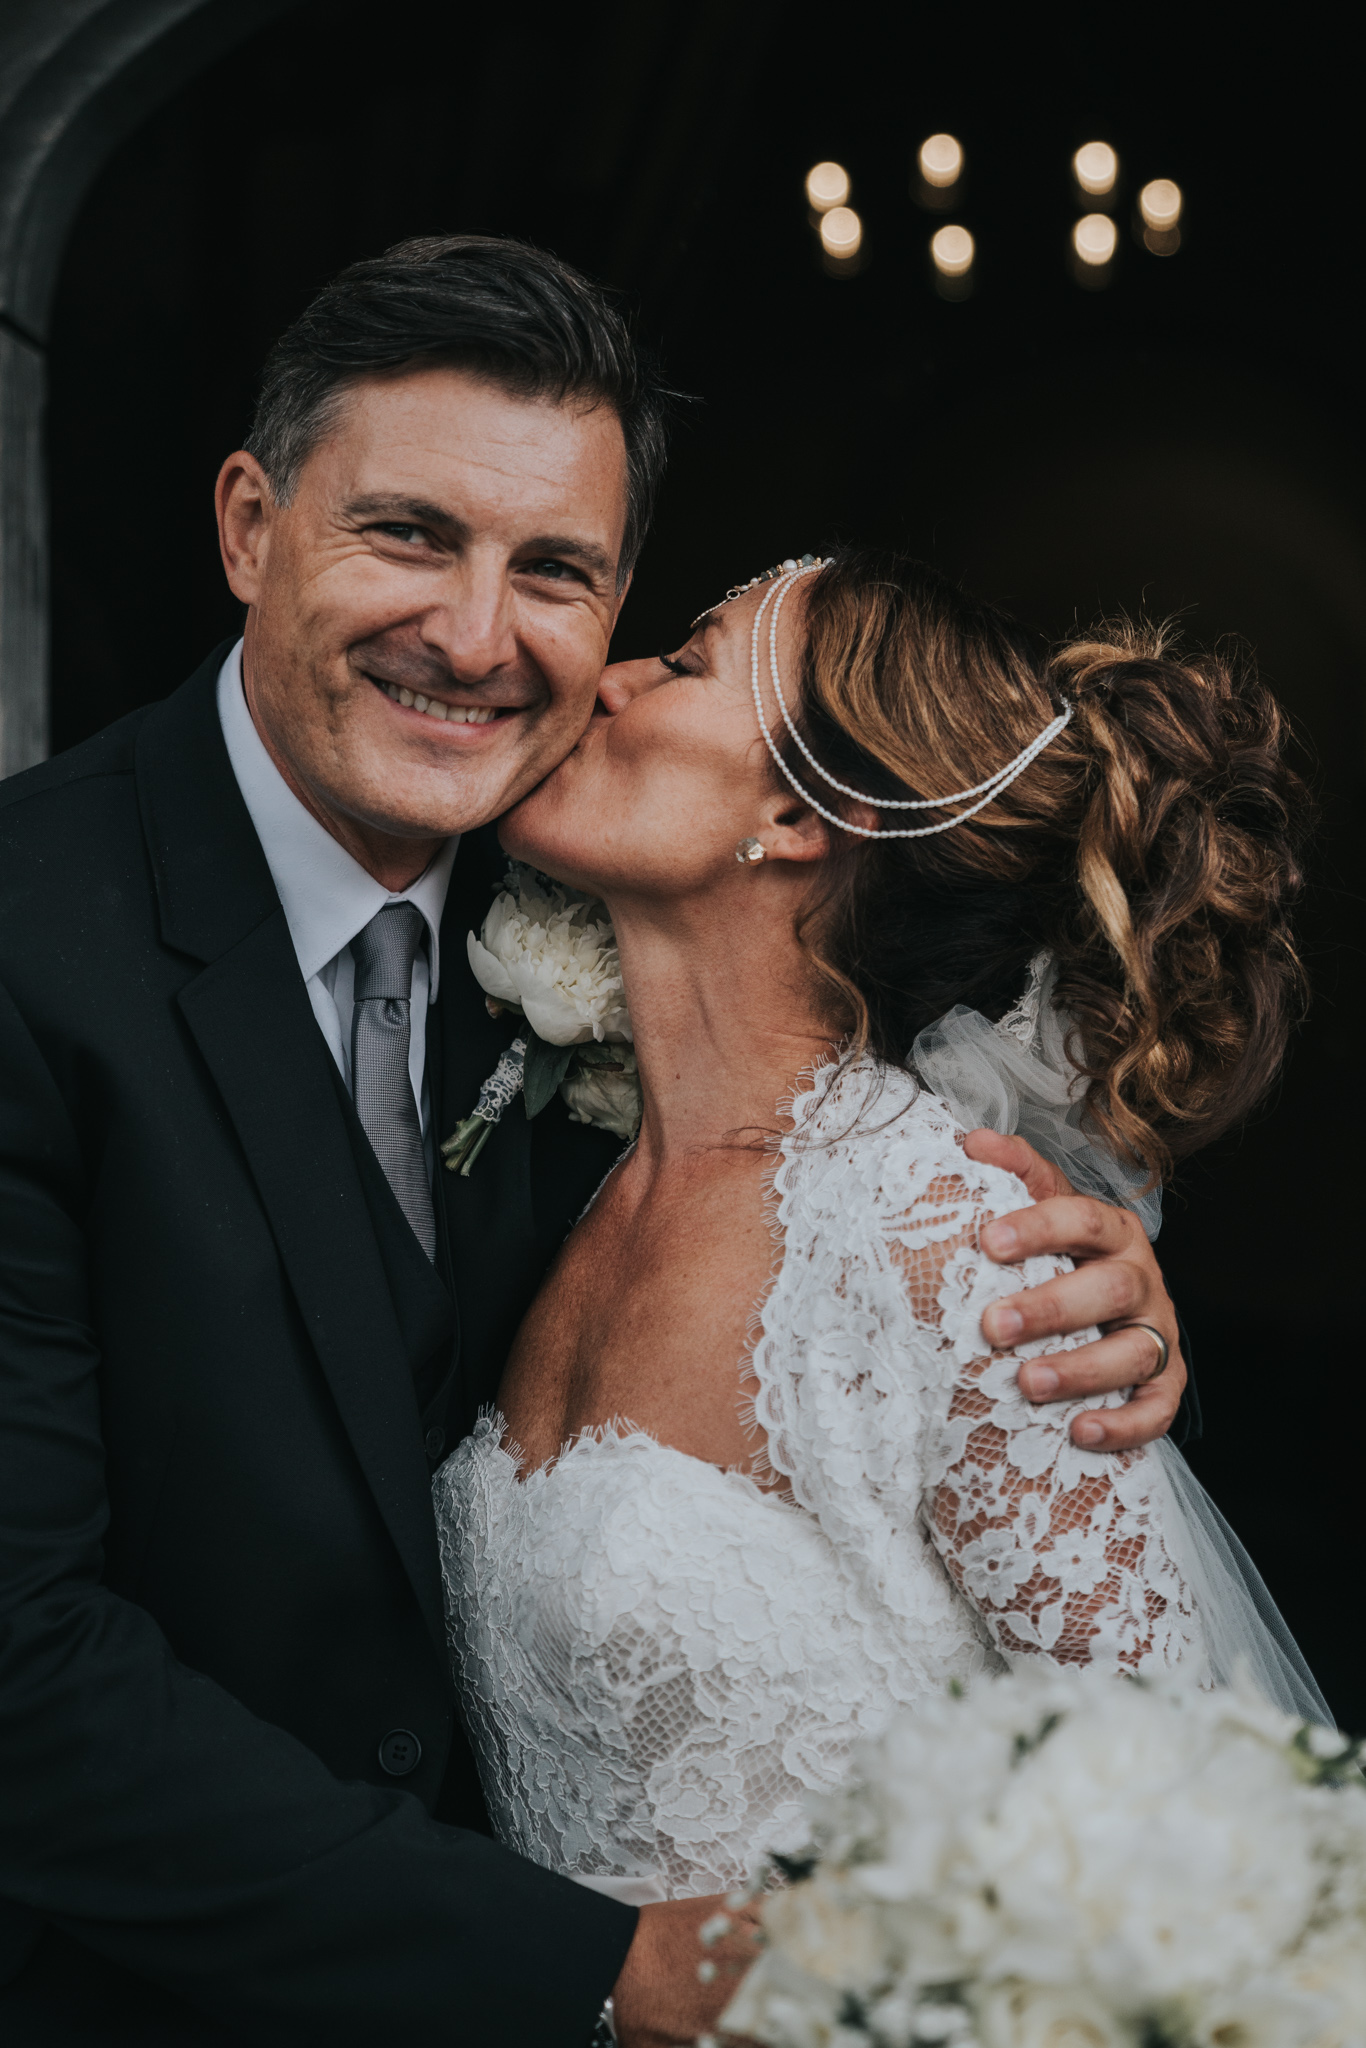 grace-elizabeth-boho-wedding-headingham-castle-essex-wedding-photographer-49.jpg